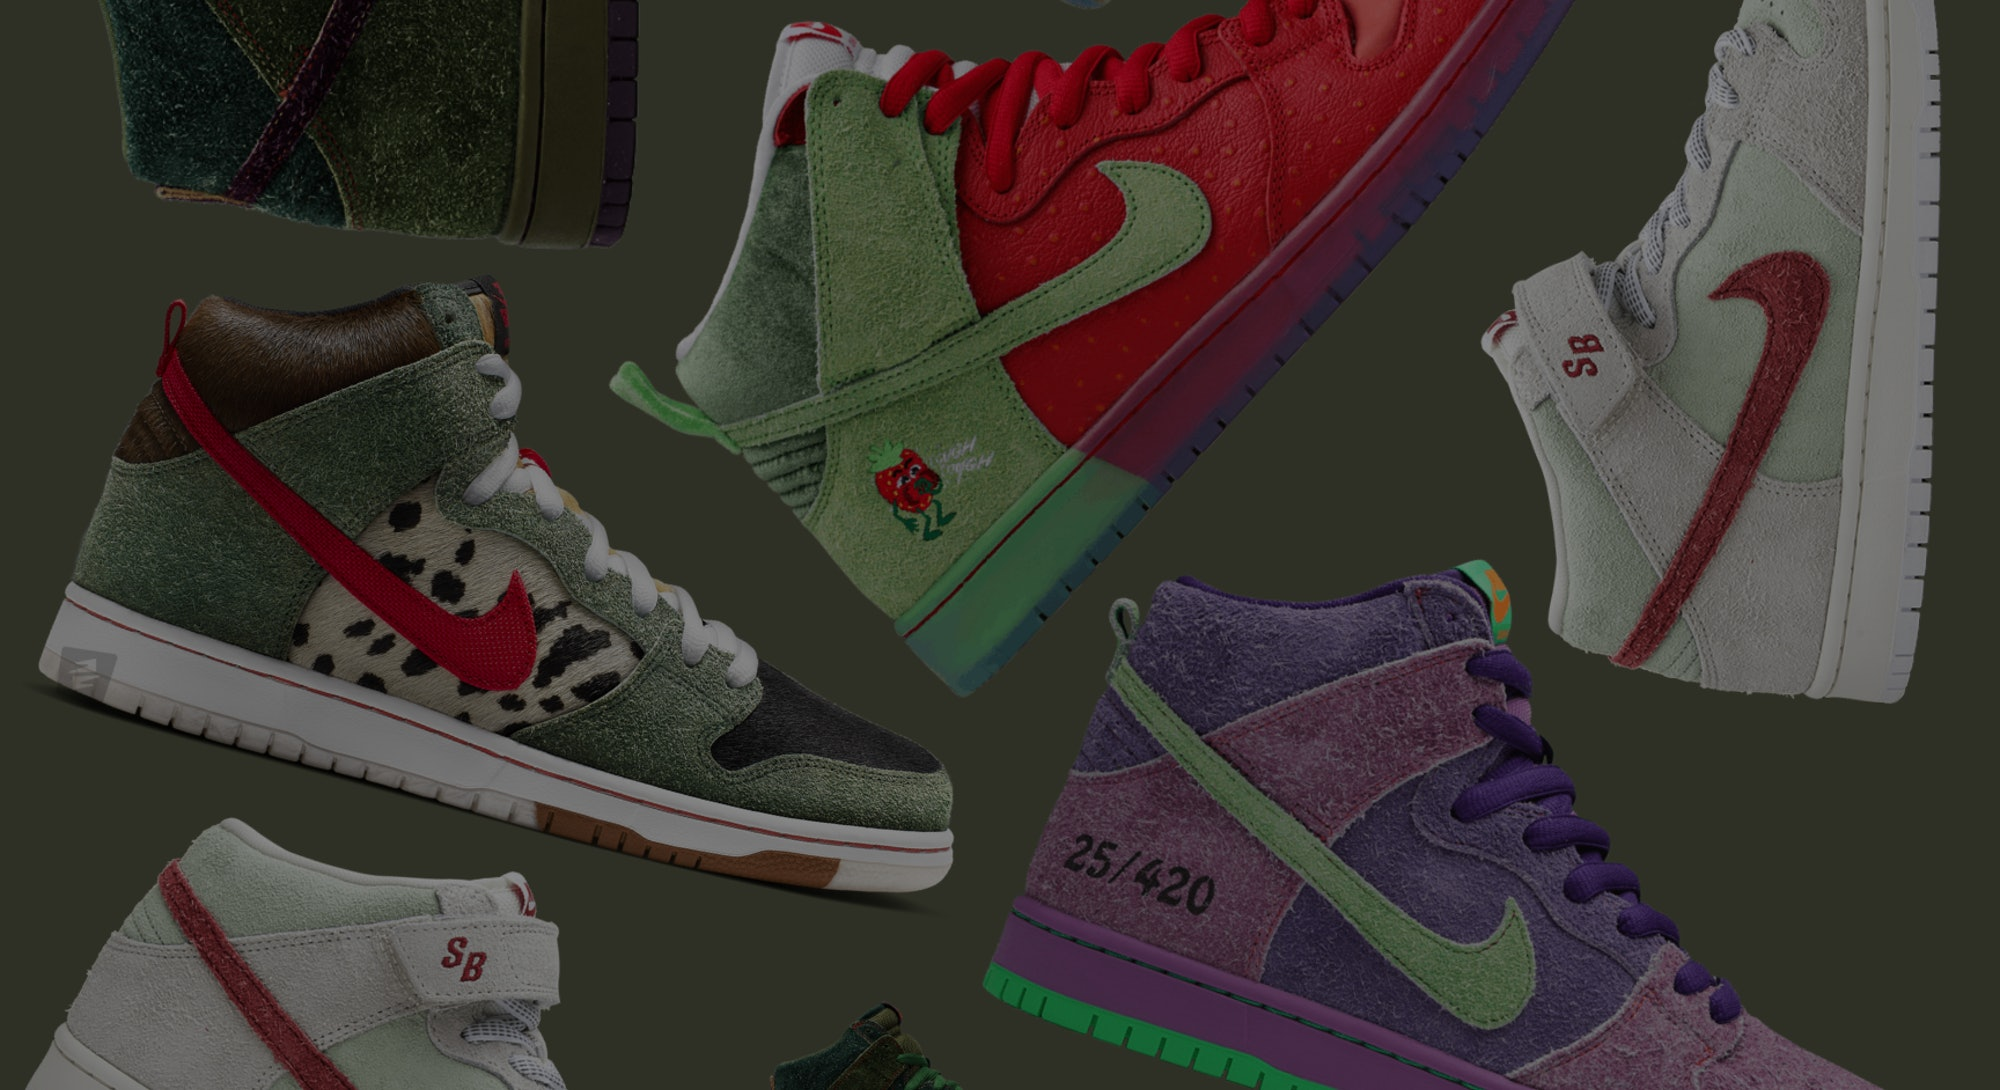 Nike SB 4/20 Dunks